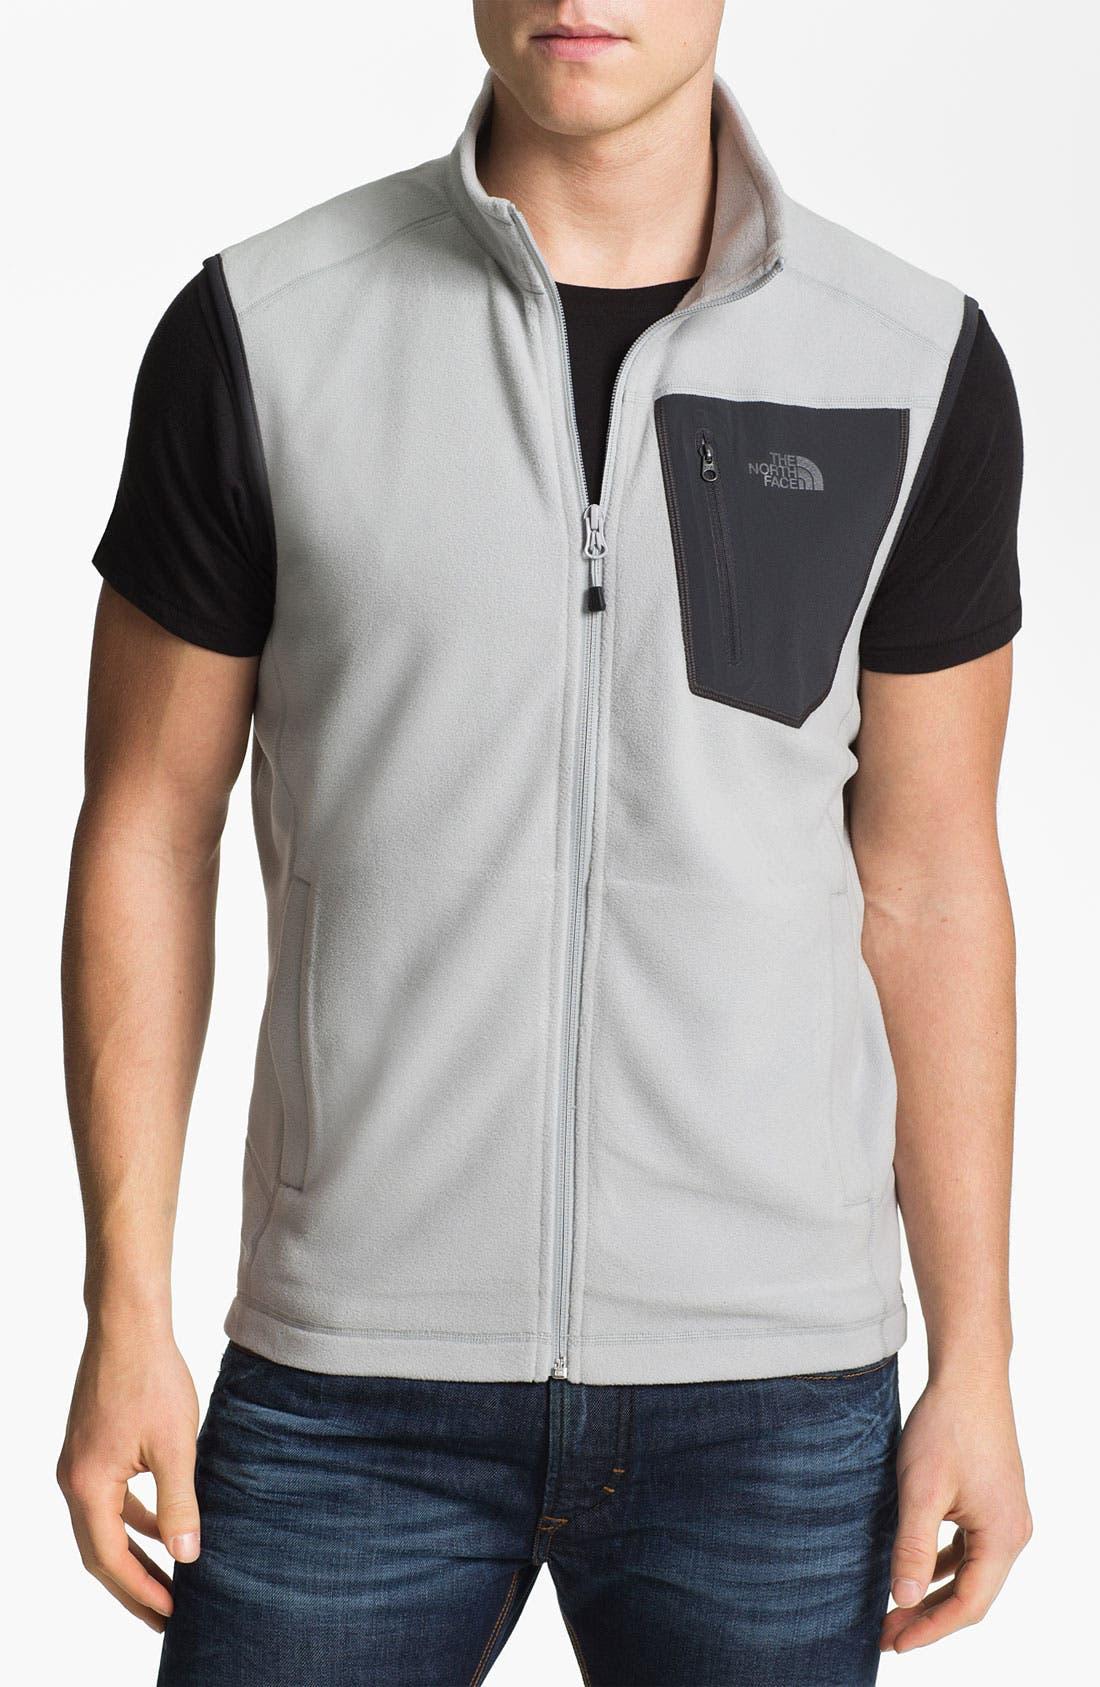 Alternate Image 1 Selected - The North Face 'TKA 100 Trinity Alps' Fleece Vest